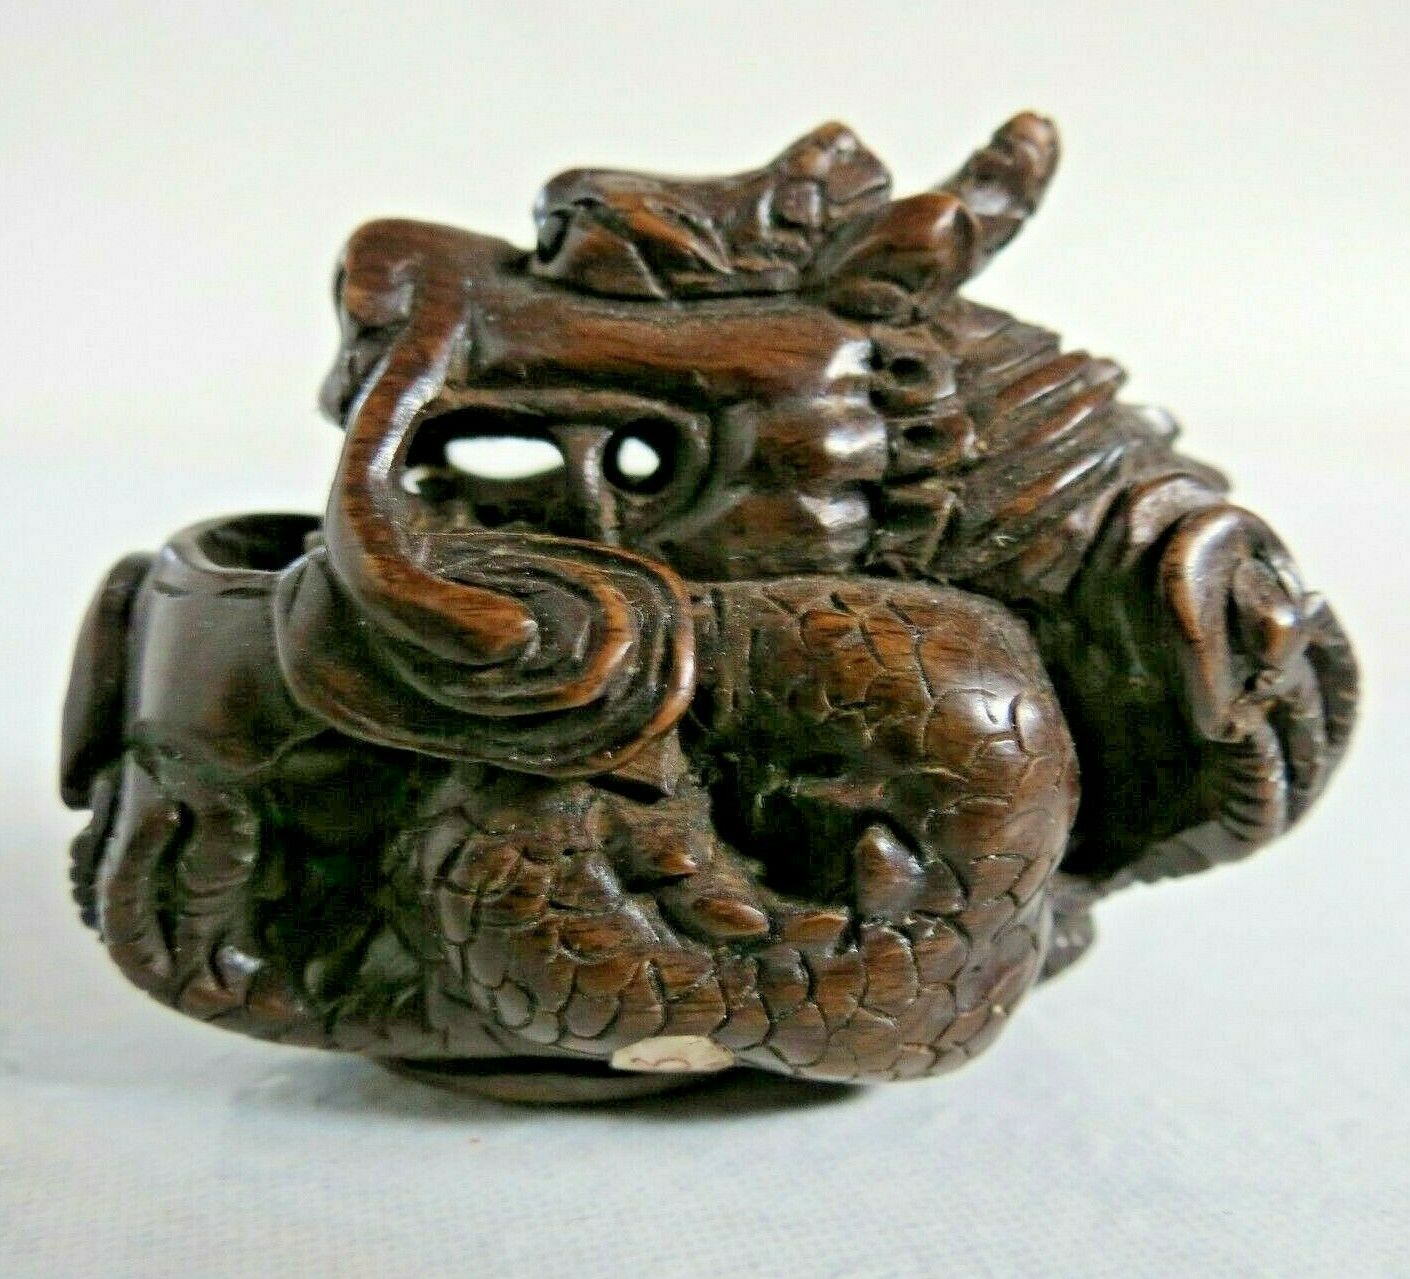 19th-20th century Japanese boxwood Netsuke Seated dragon Signed unknown onyx eye